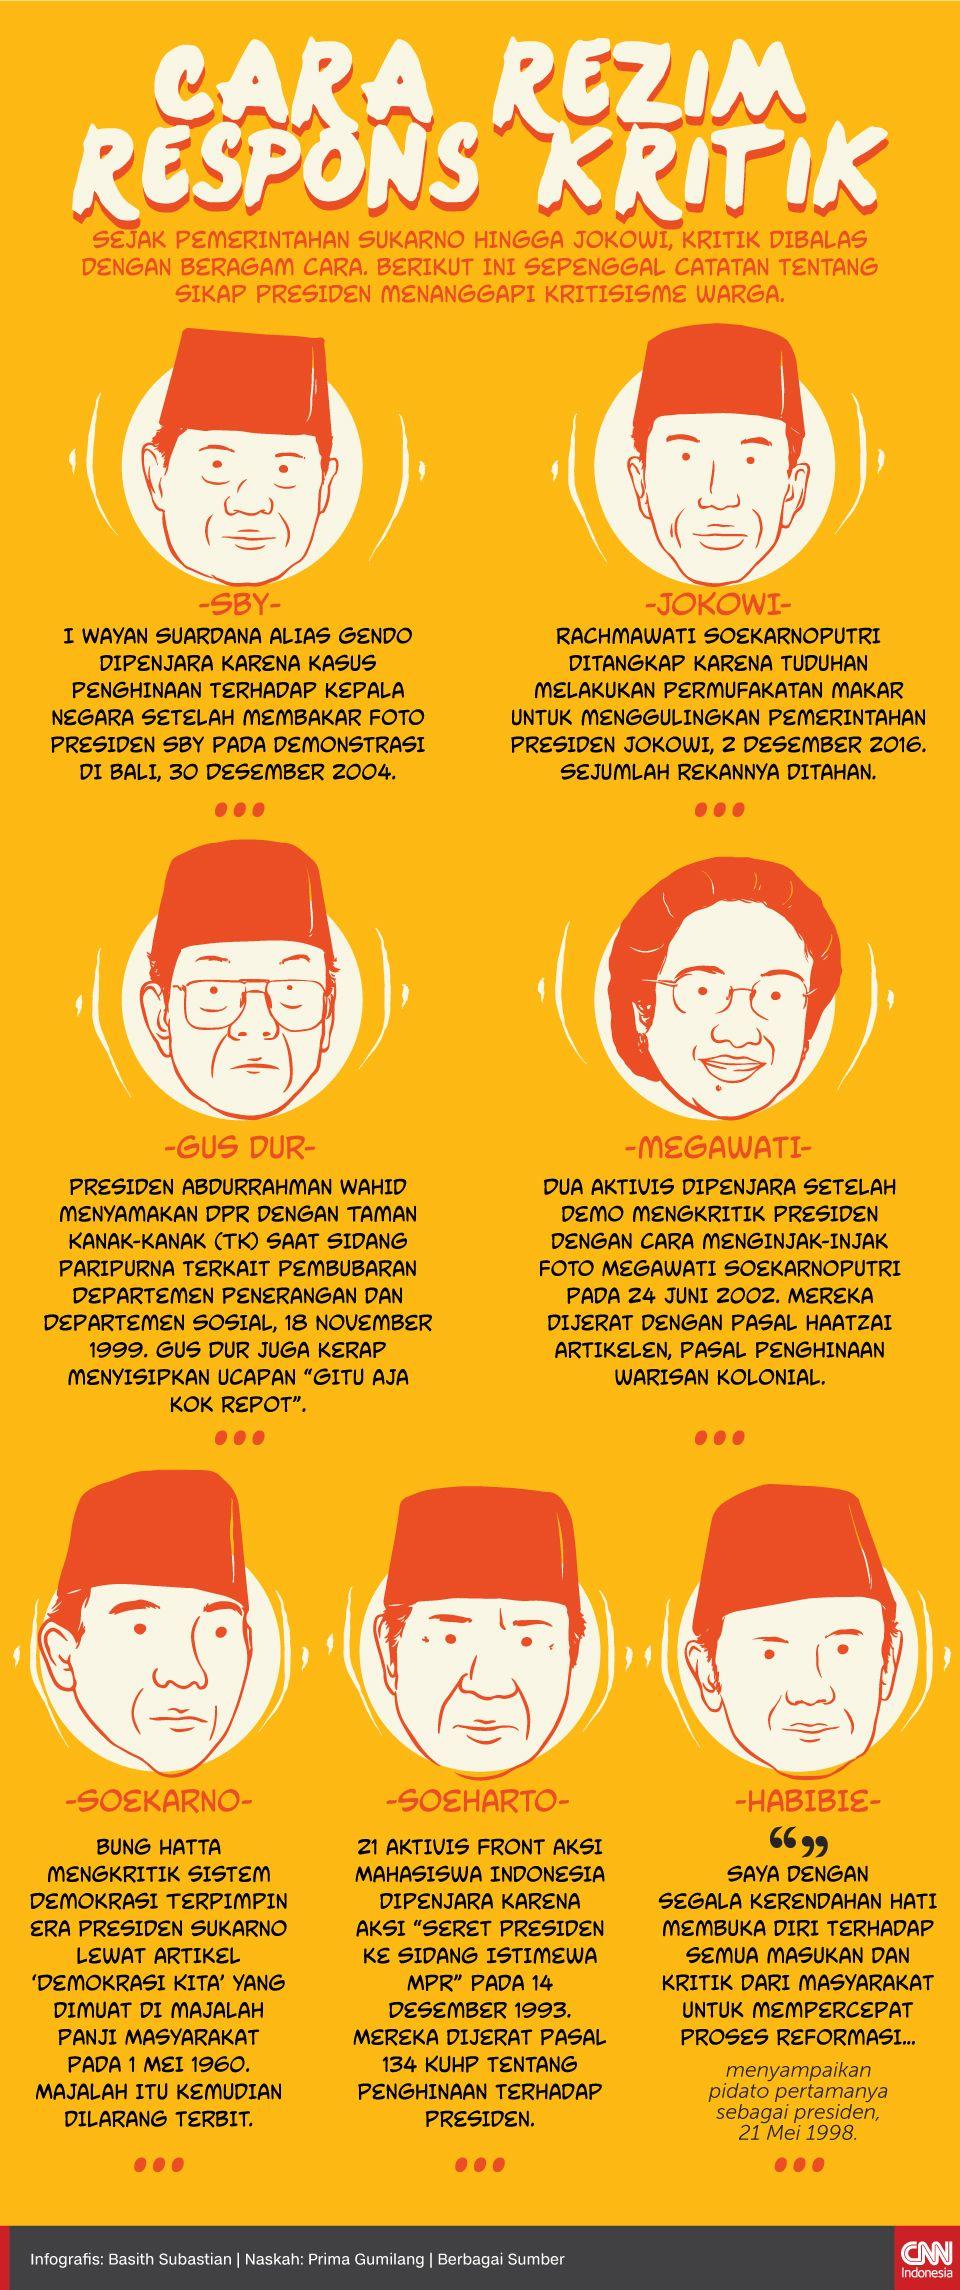 Infografis Cara Rezim Respons Kritik